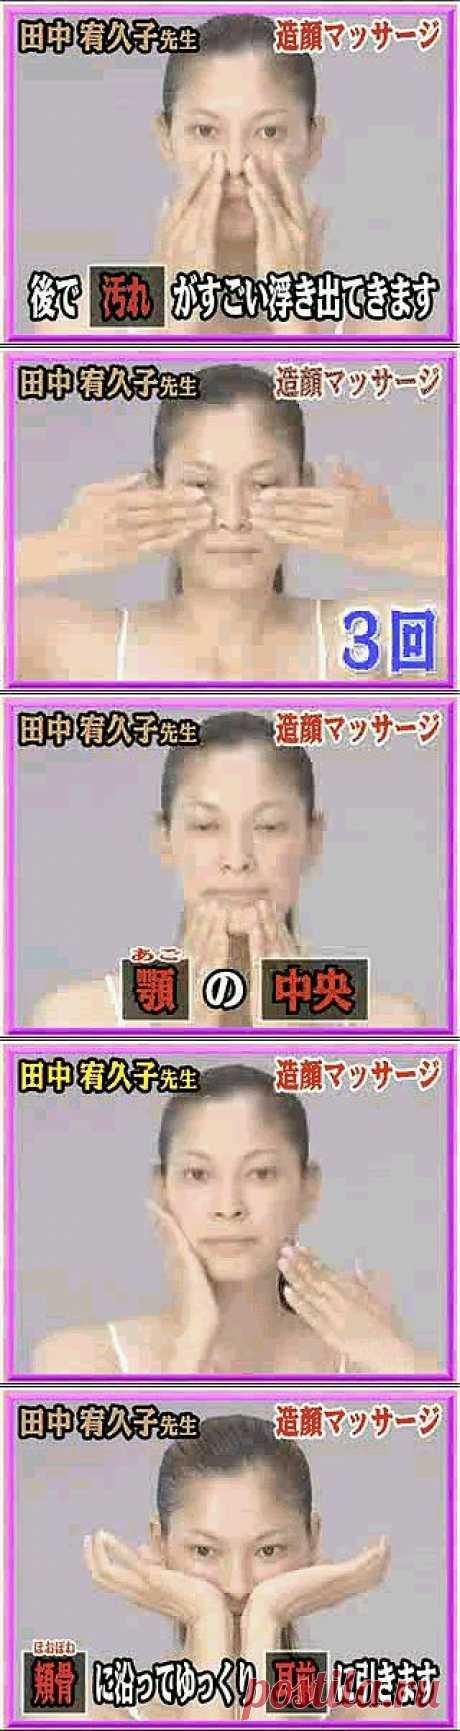 Японский Массаж лица - Стань на 10 лет моложе!